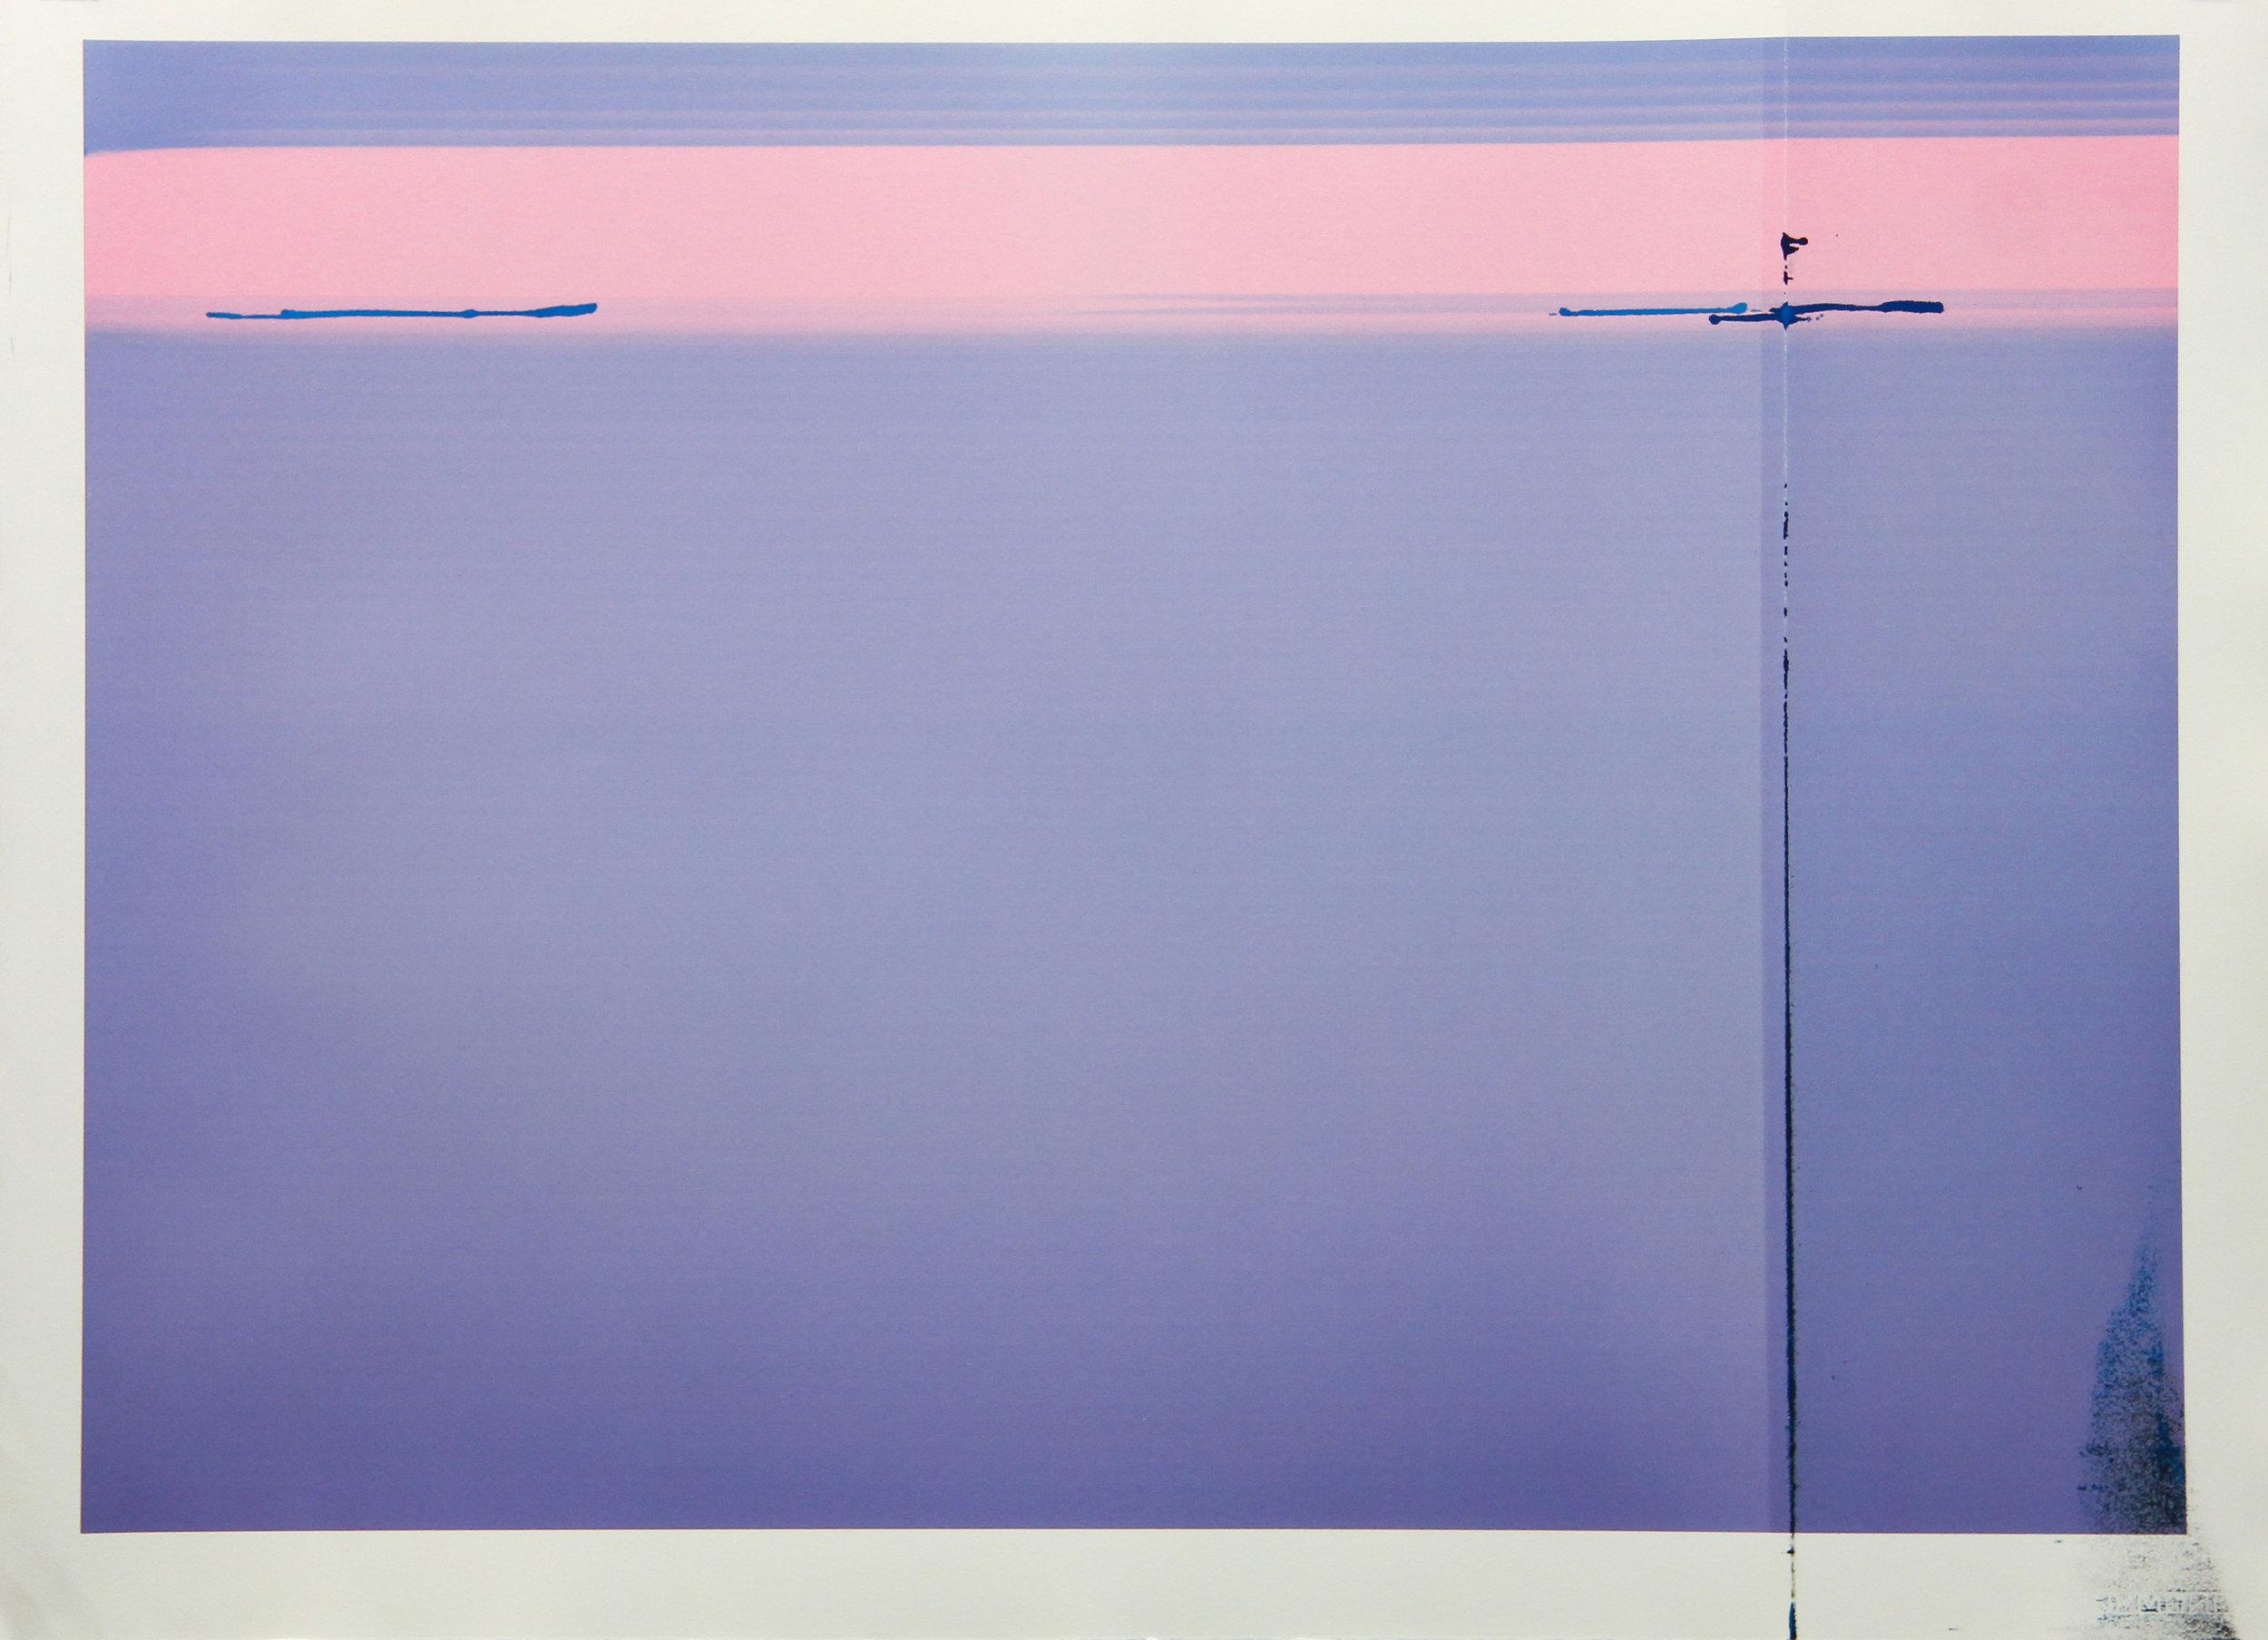 Tinted Headstrike #13, 2015 Unique giclée print, 107 x 78 cm